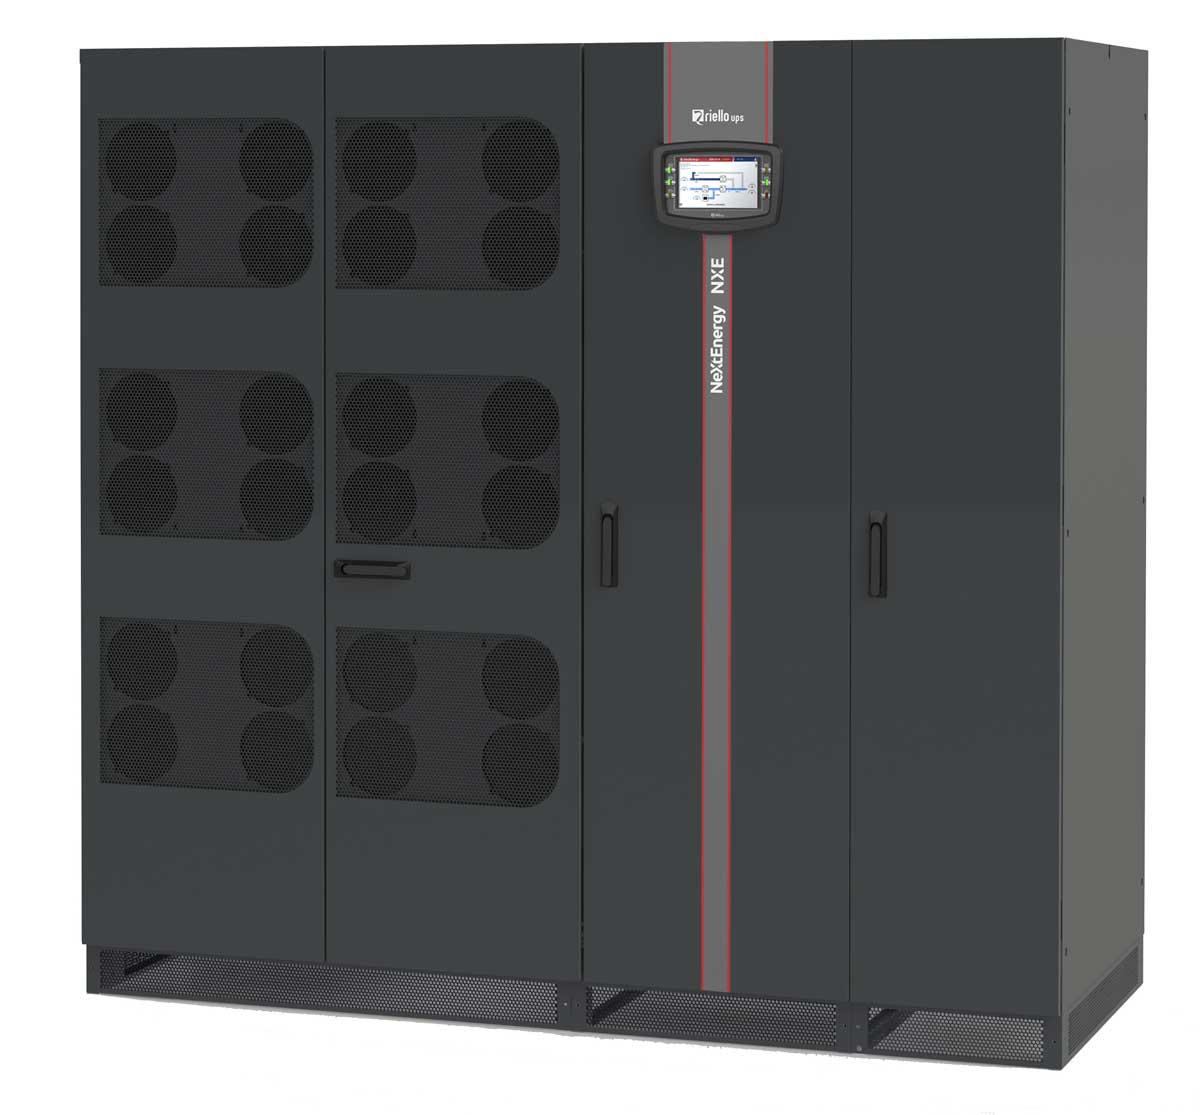 Riello UPS NextEnergy 600 kVA